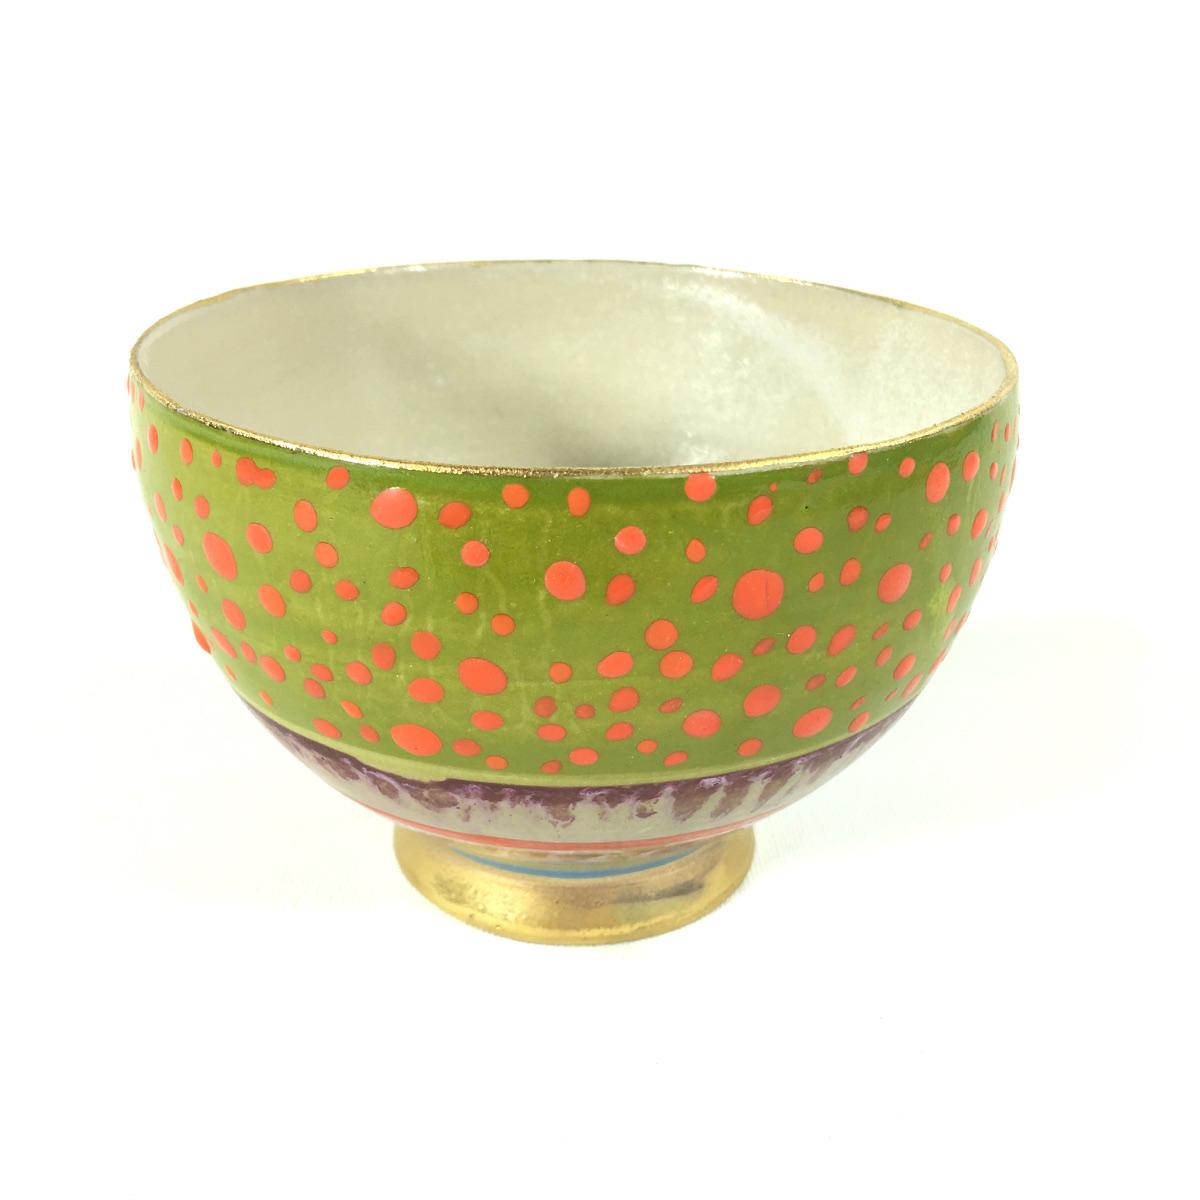 Keramikbowl Punktmuster (grün) Bild 2